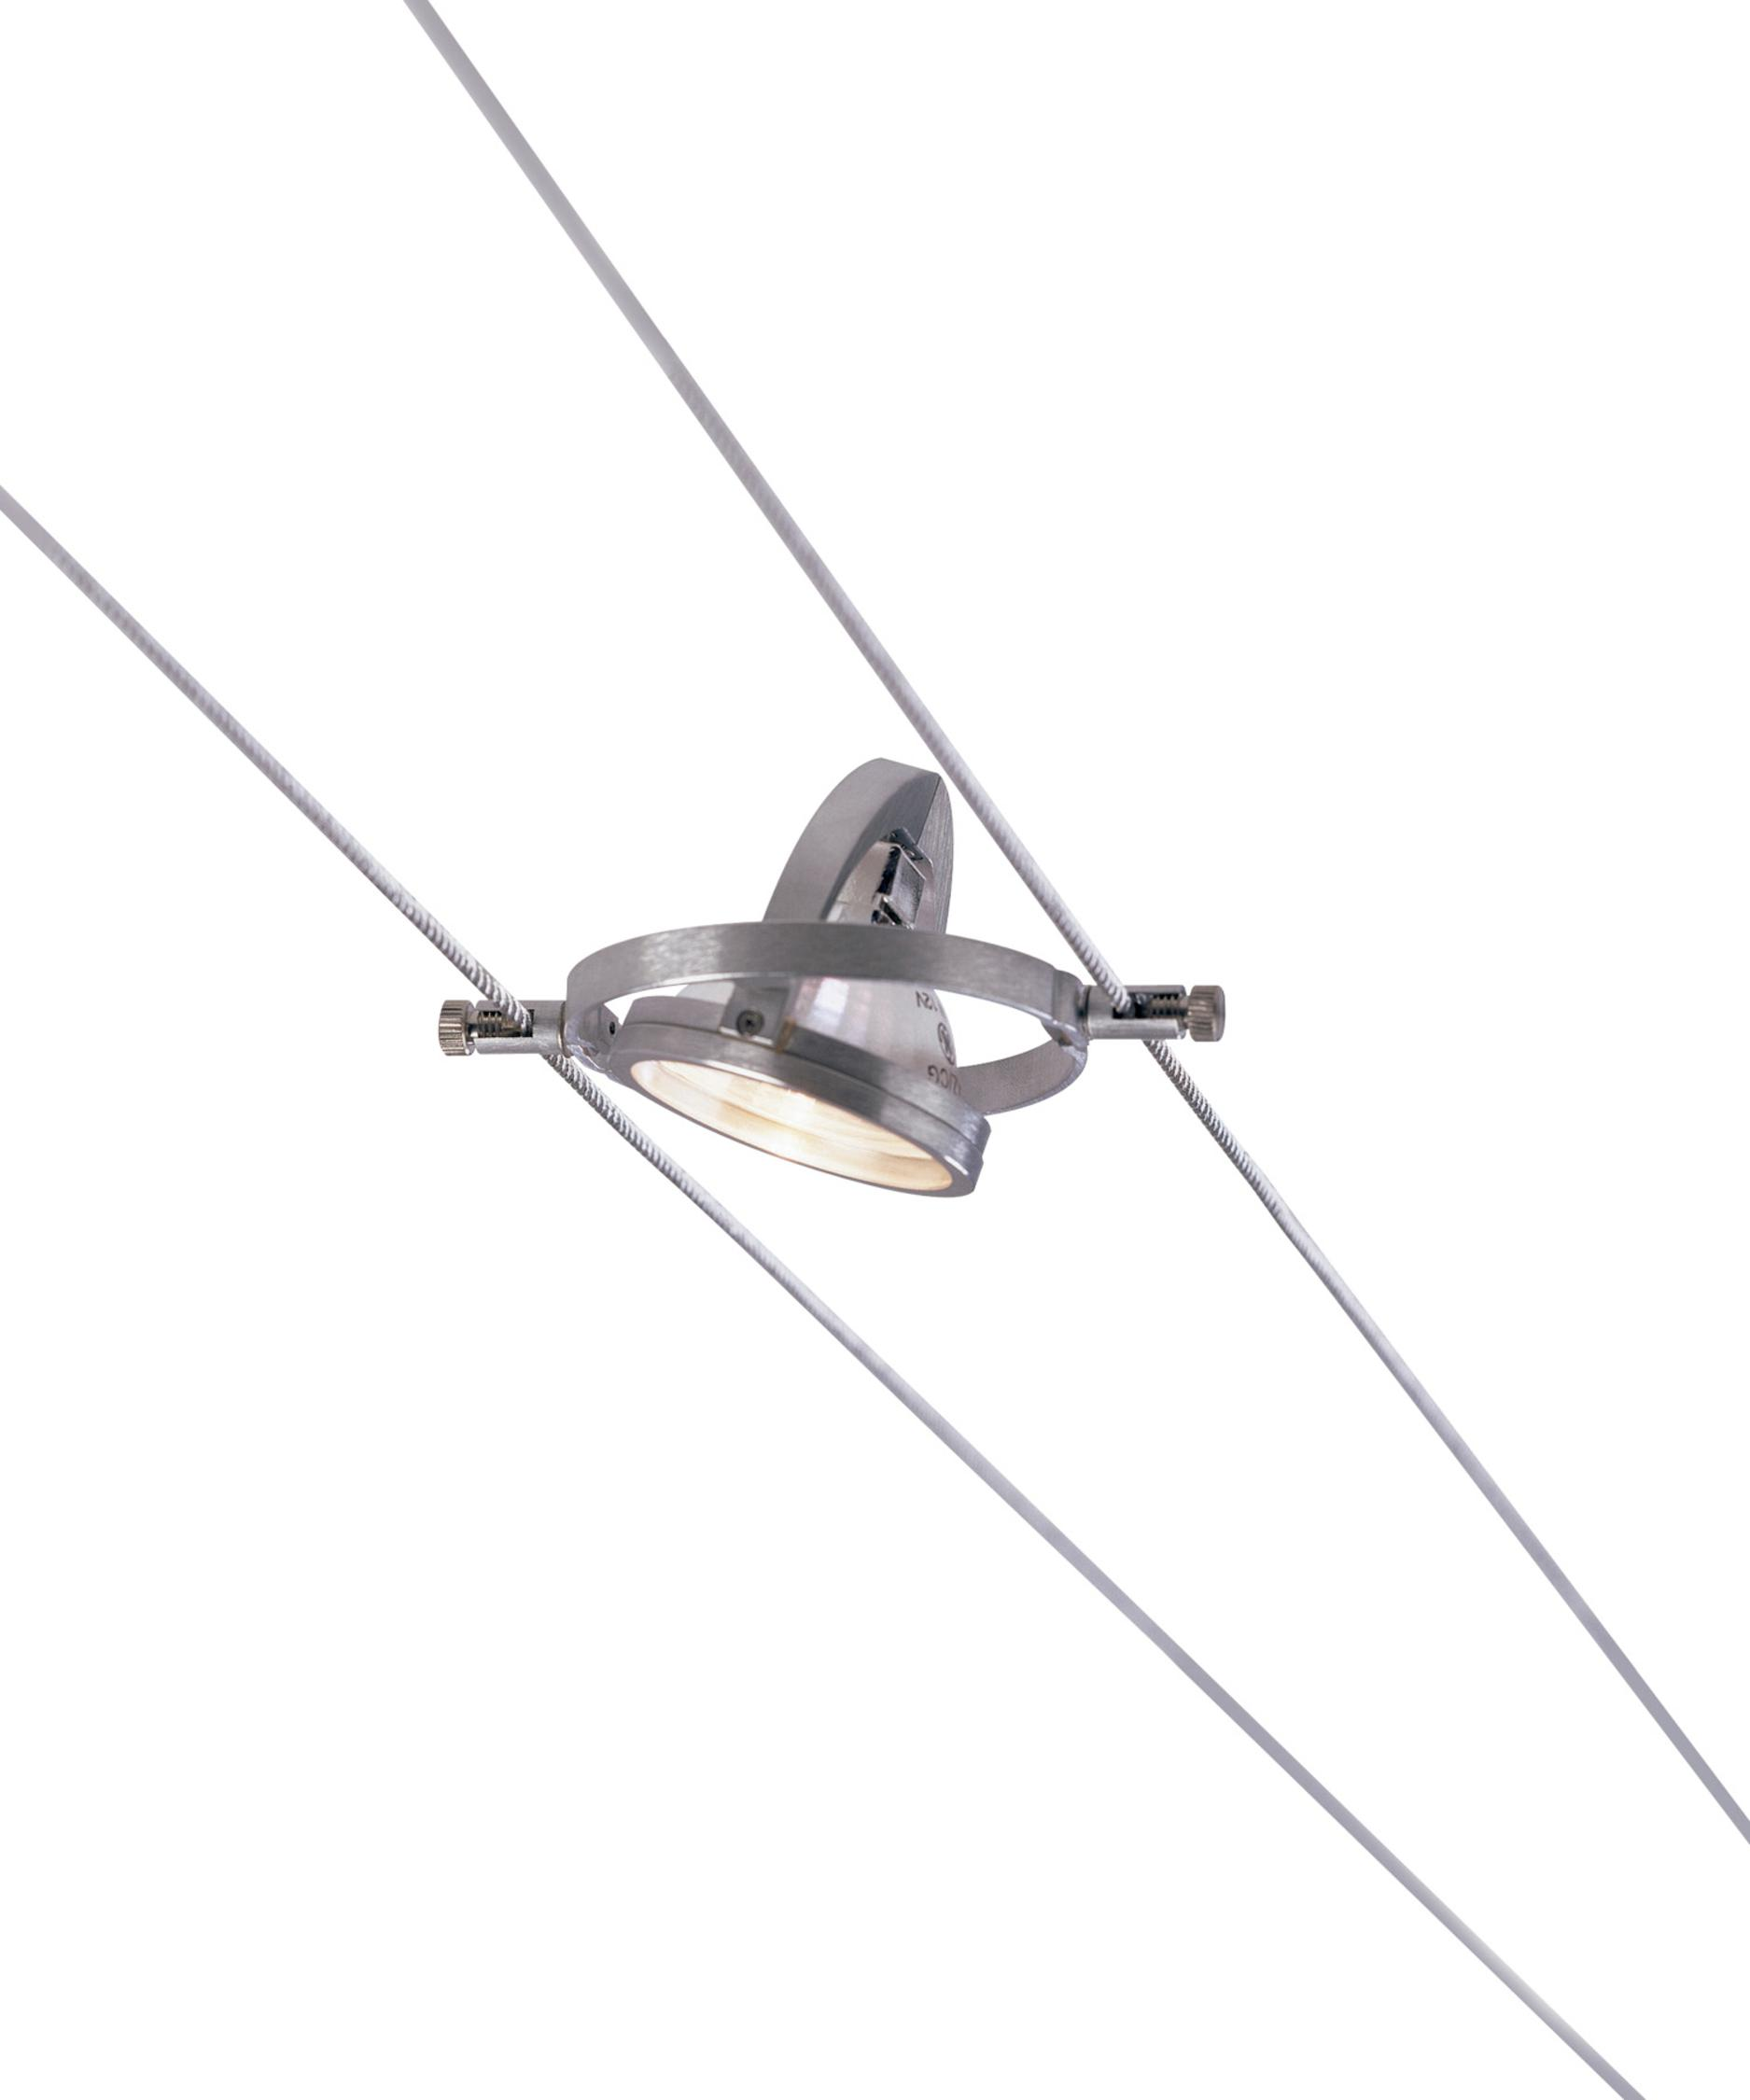 Tech Lighting 700KHELLO K Hello 4 Inch Cable Fixture Capitol